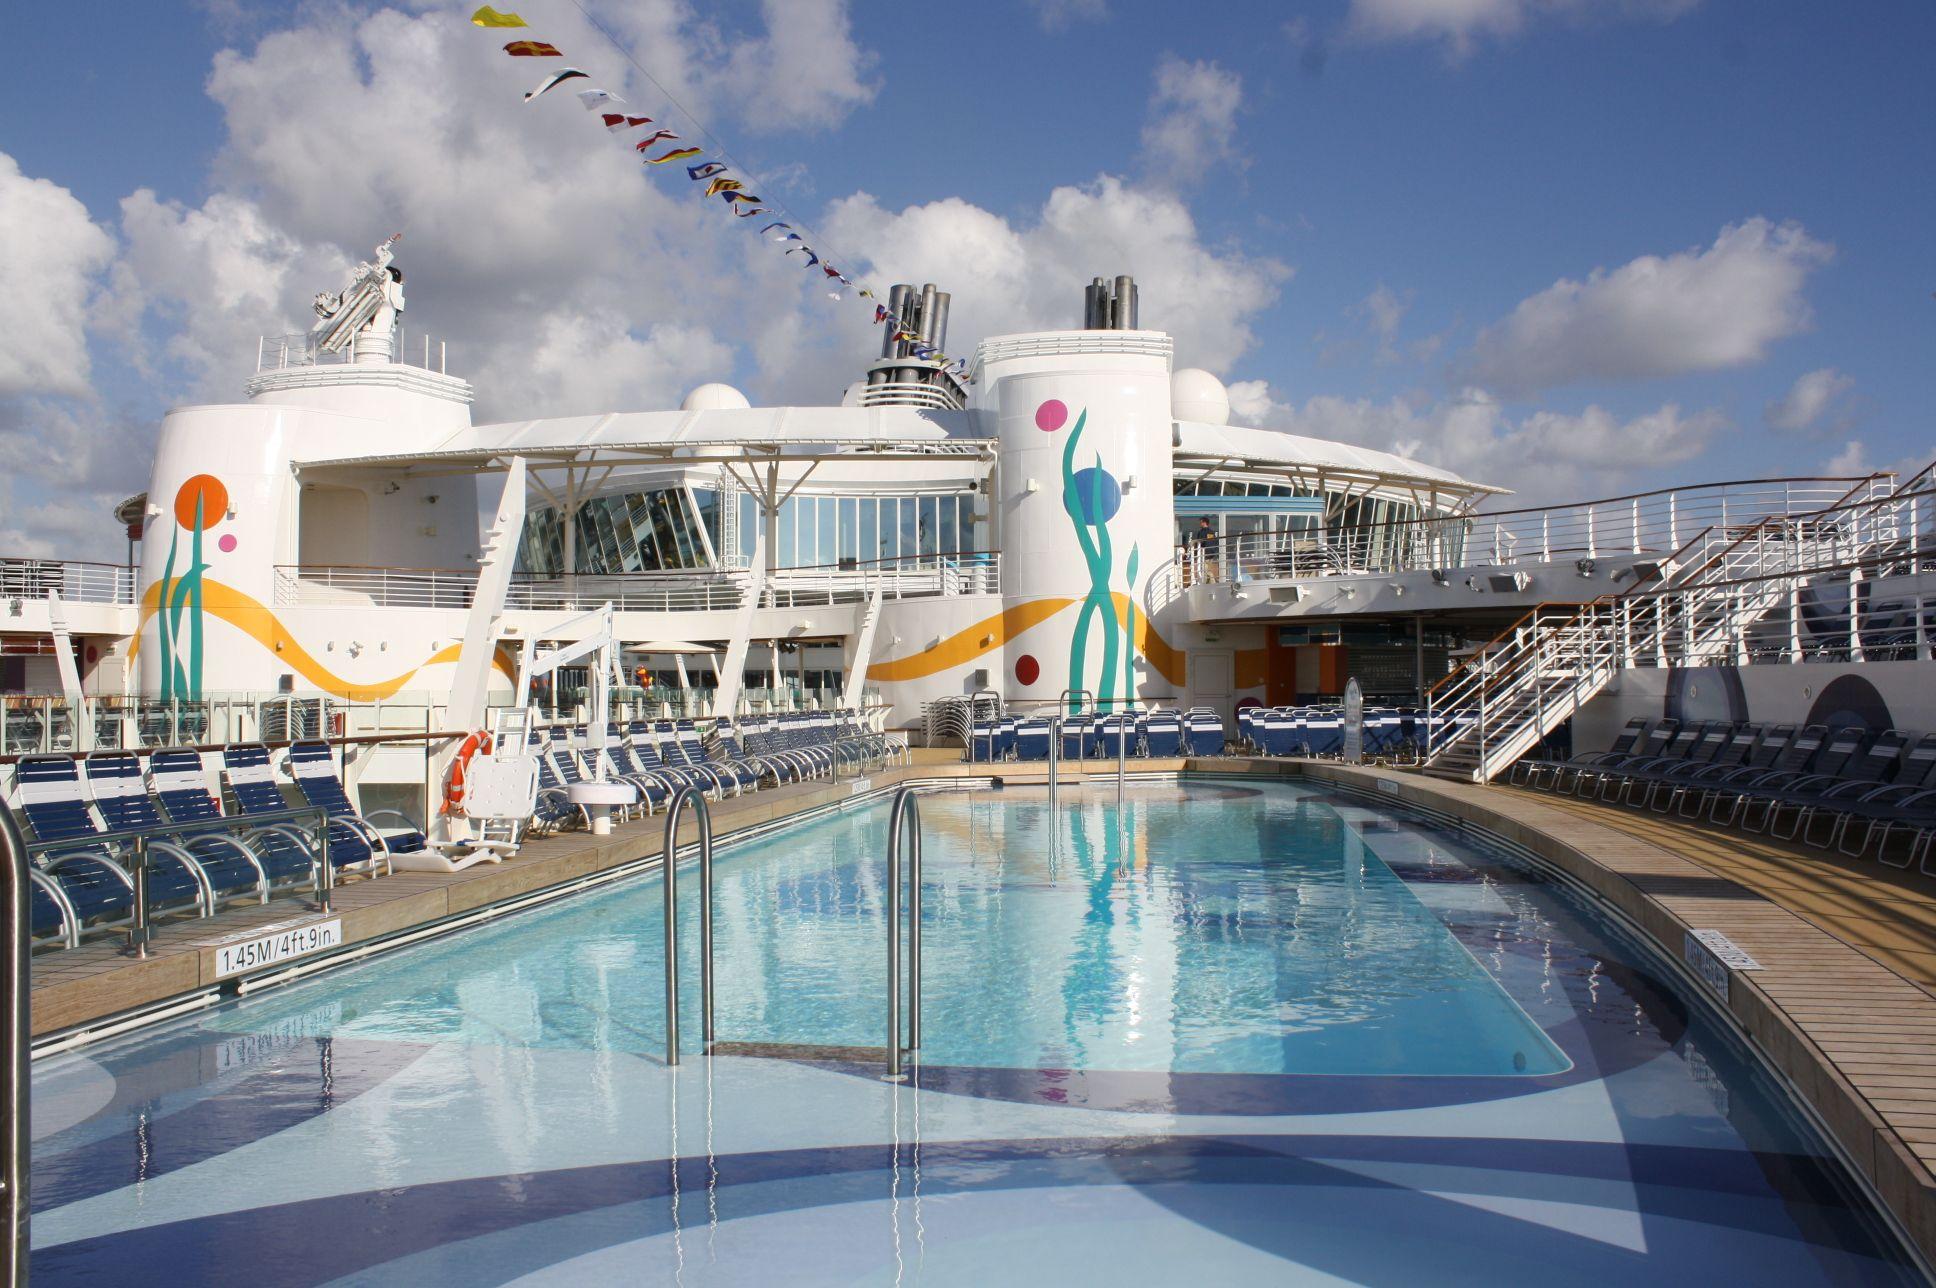 Allure Of The Seas Pool Deck Favorite Places Spaces Pinterest